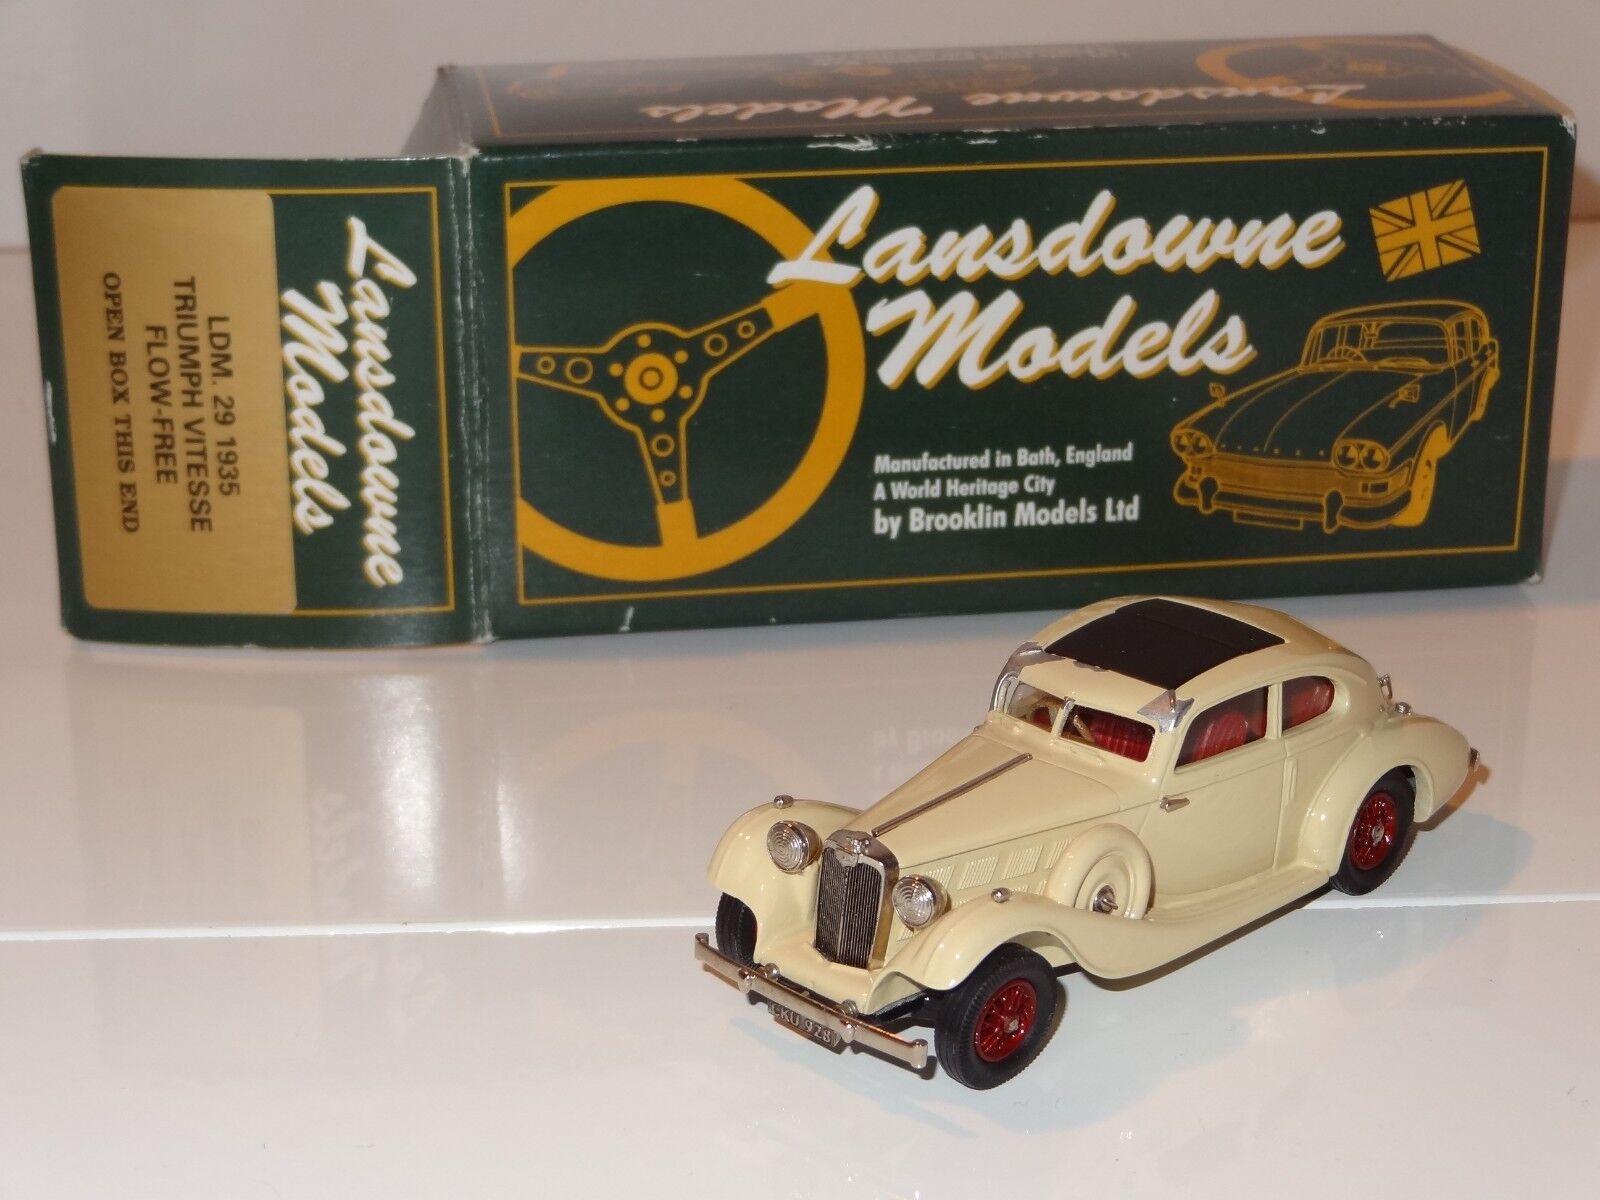 (EB) LANSDOWNE BROOKLIN BIANCO METALLO 1935 Triumph Vitesse flusso libero-LDM 29